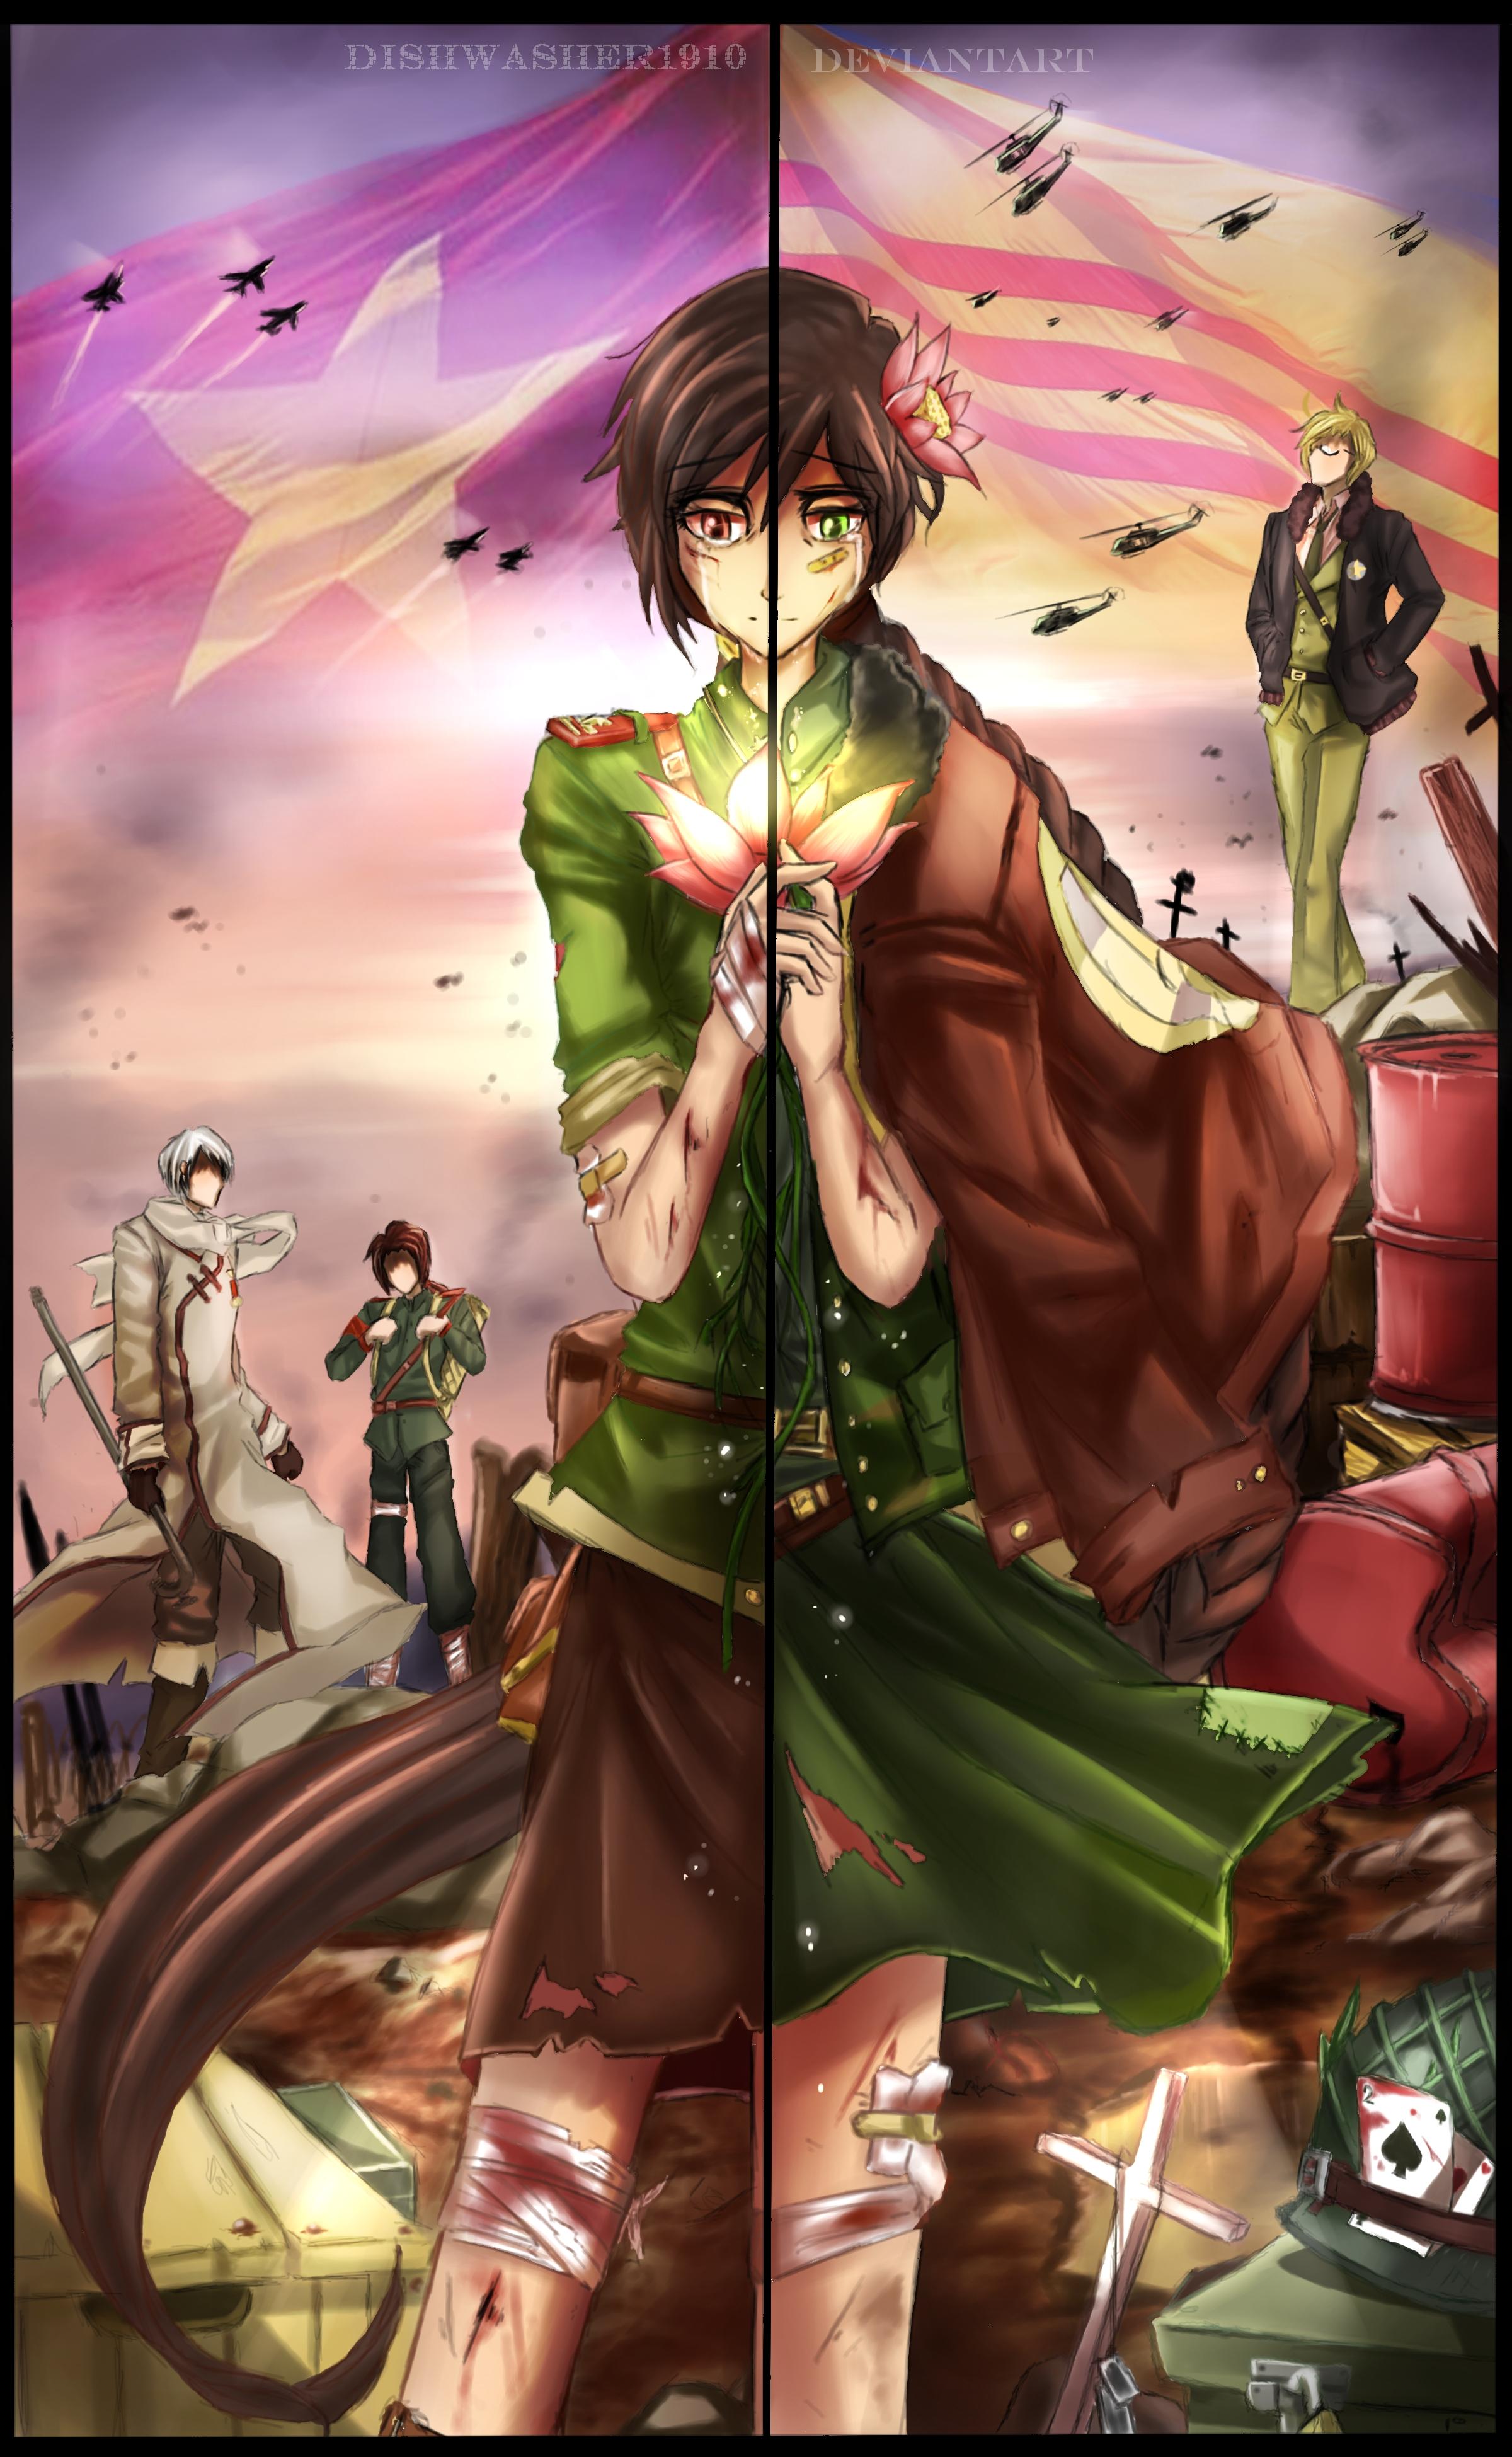 Vietnam Axis Powers Hetalia Zerochan Anime Image Board